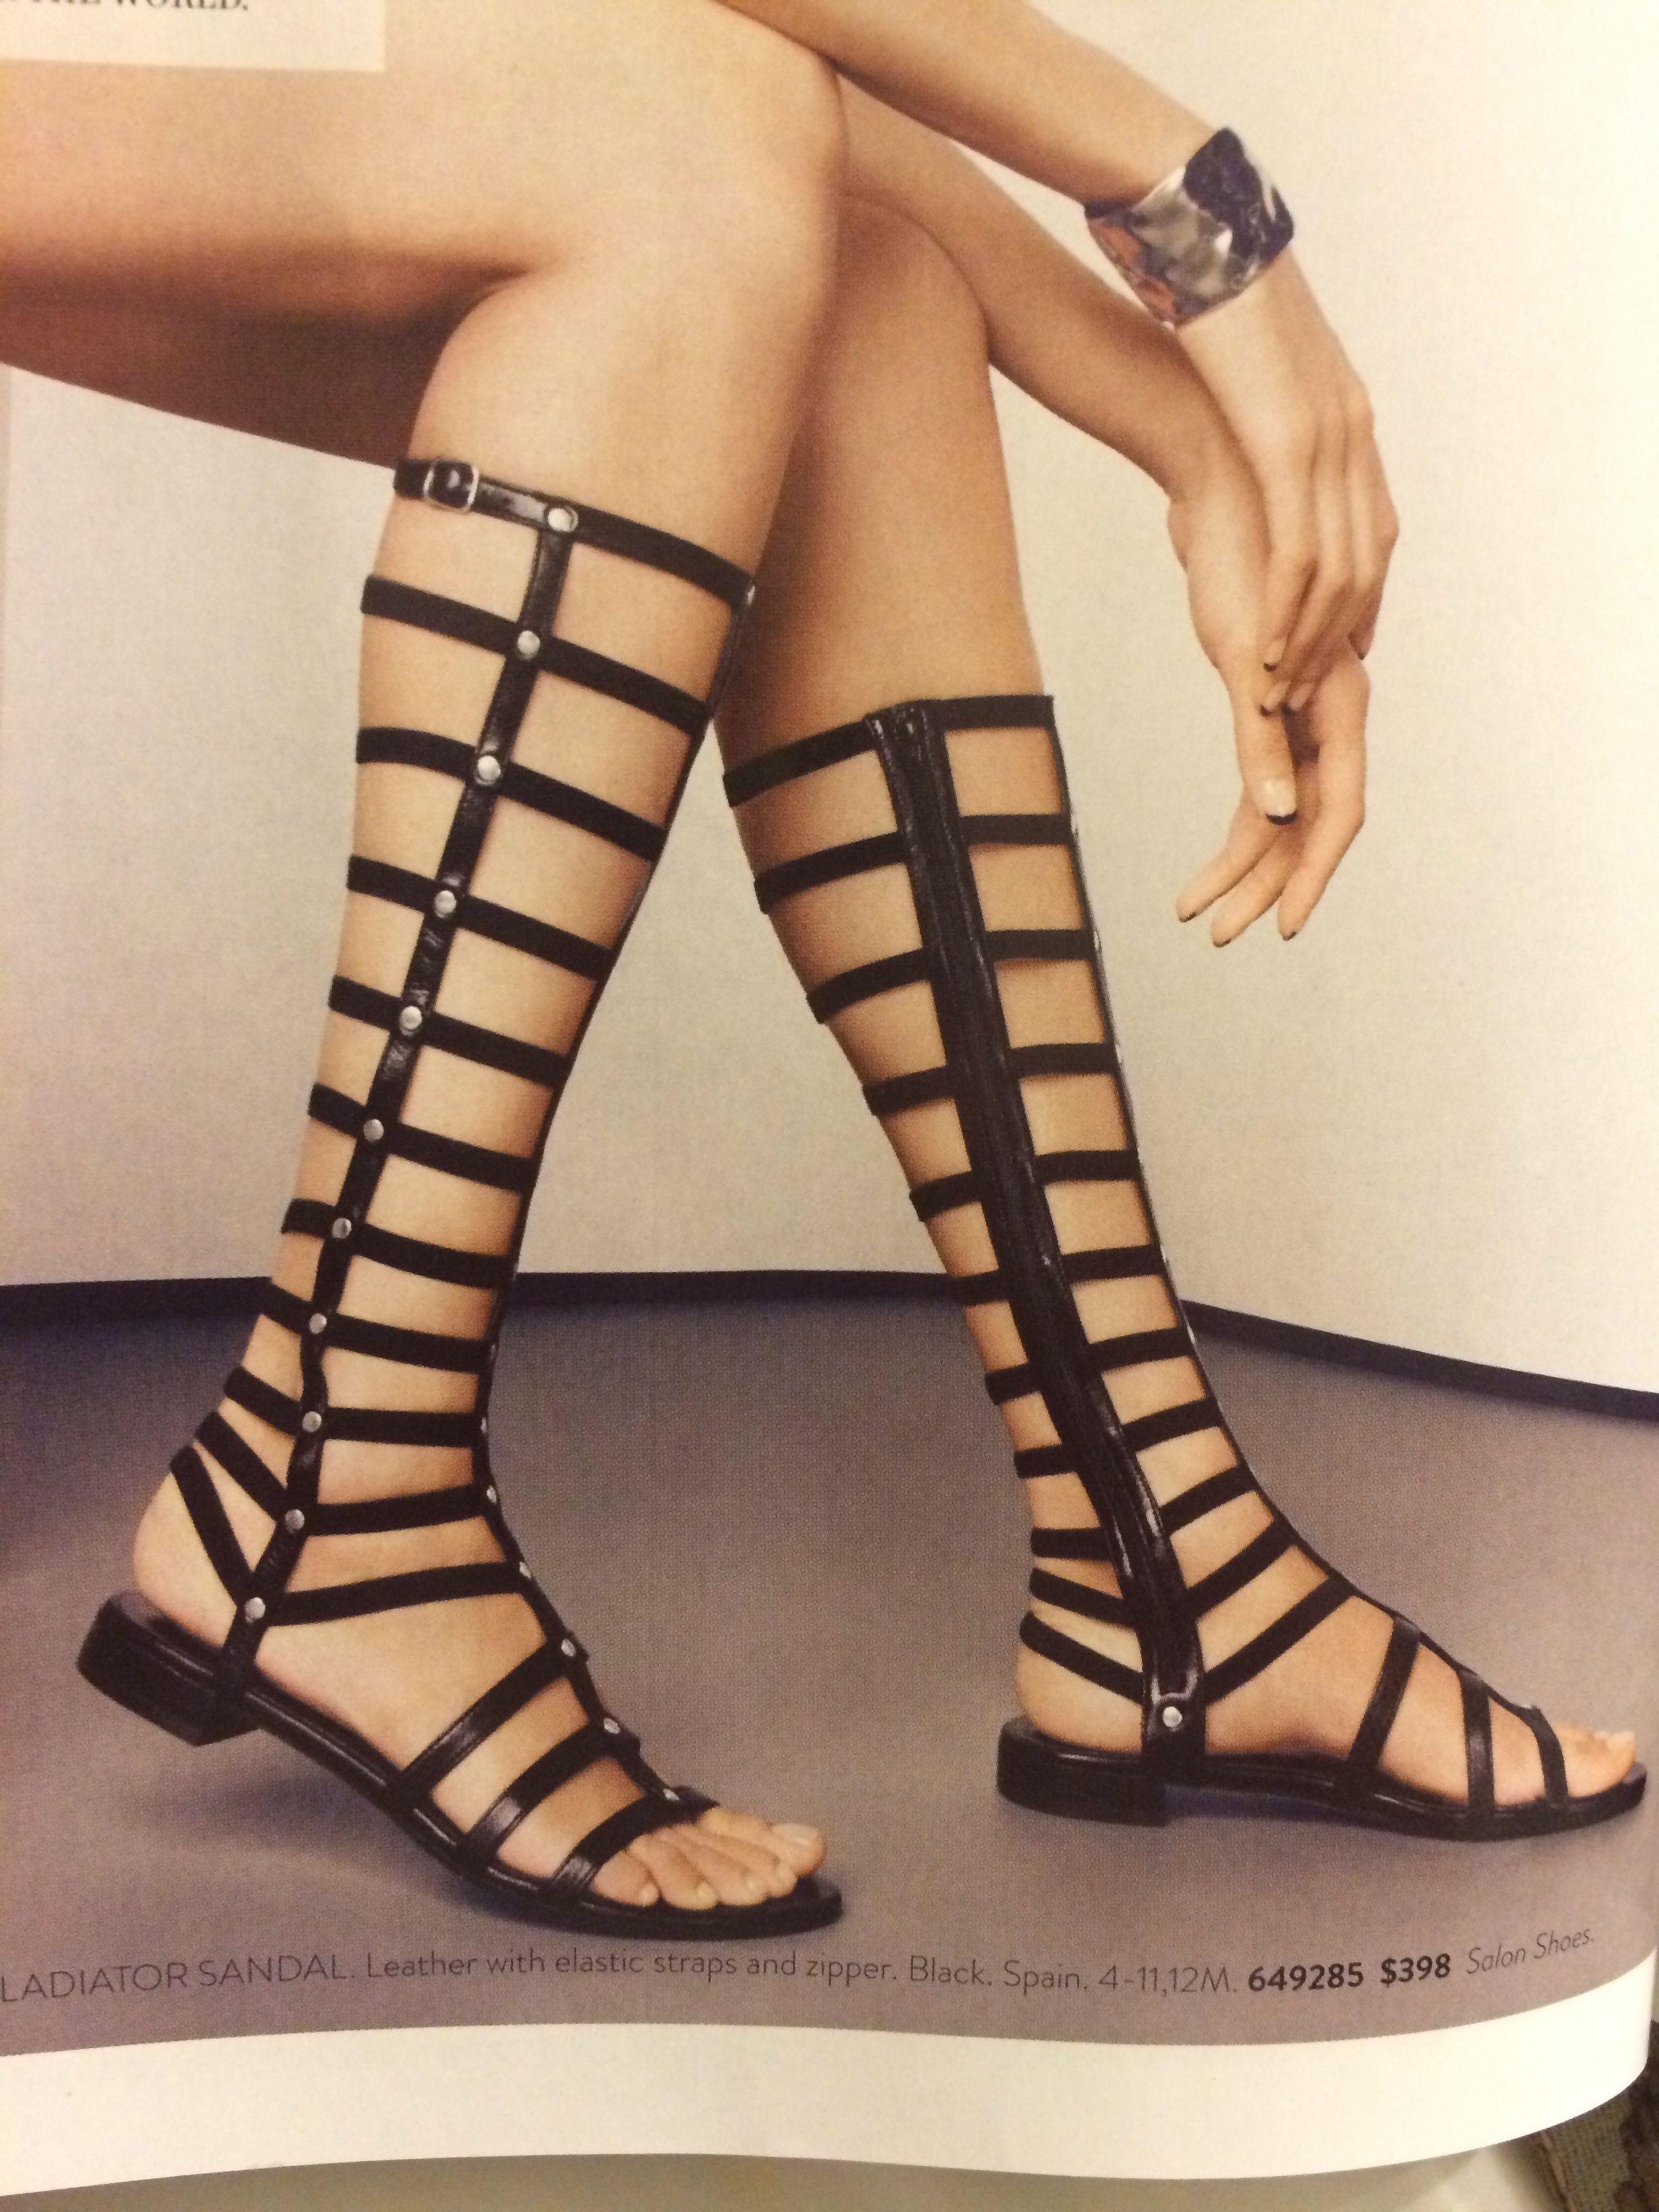 5c450e336 Stuart Weitzman Gladiator Sandal. Salon Shoe - Nordstrom   Shoes ...